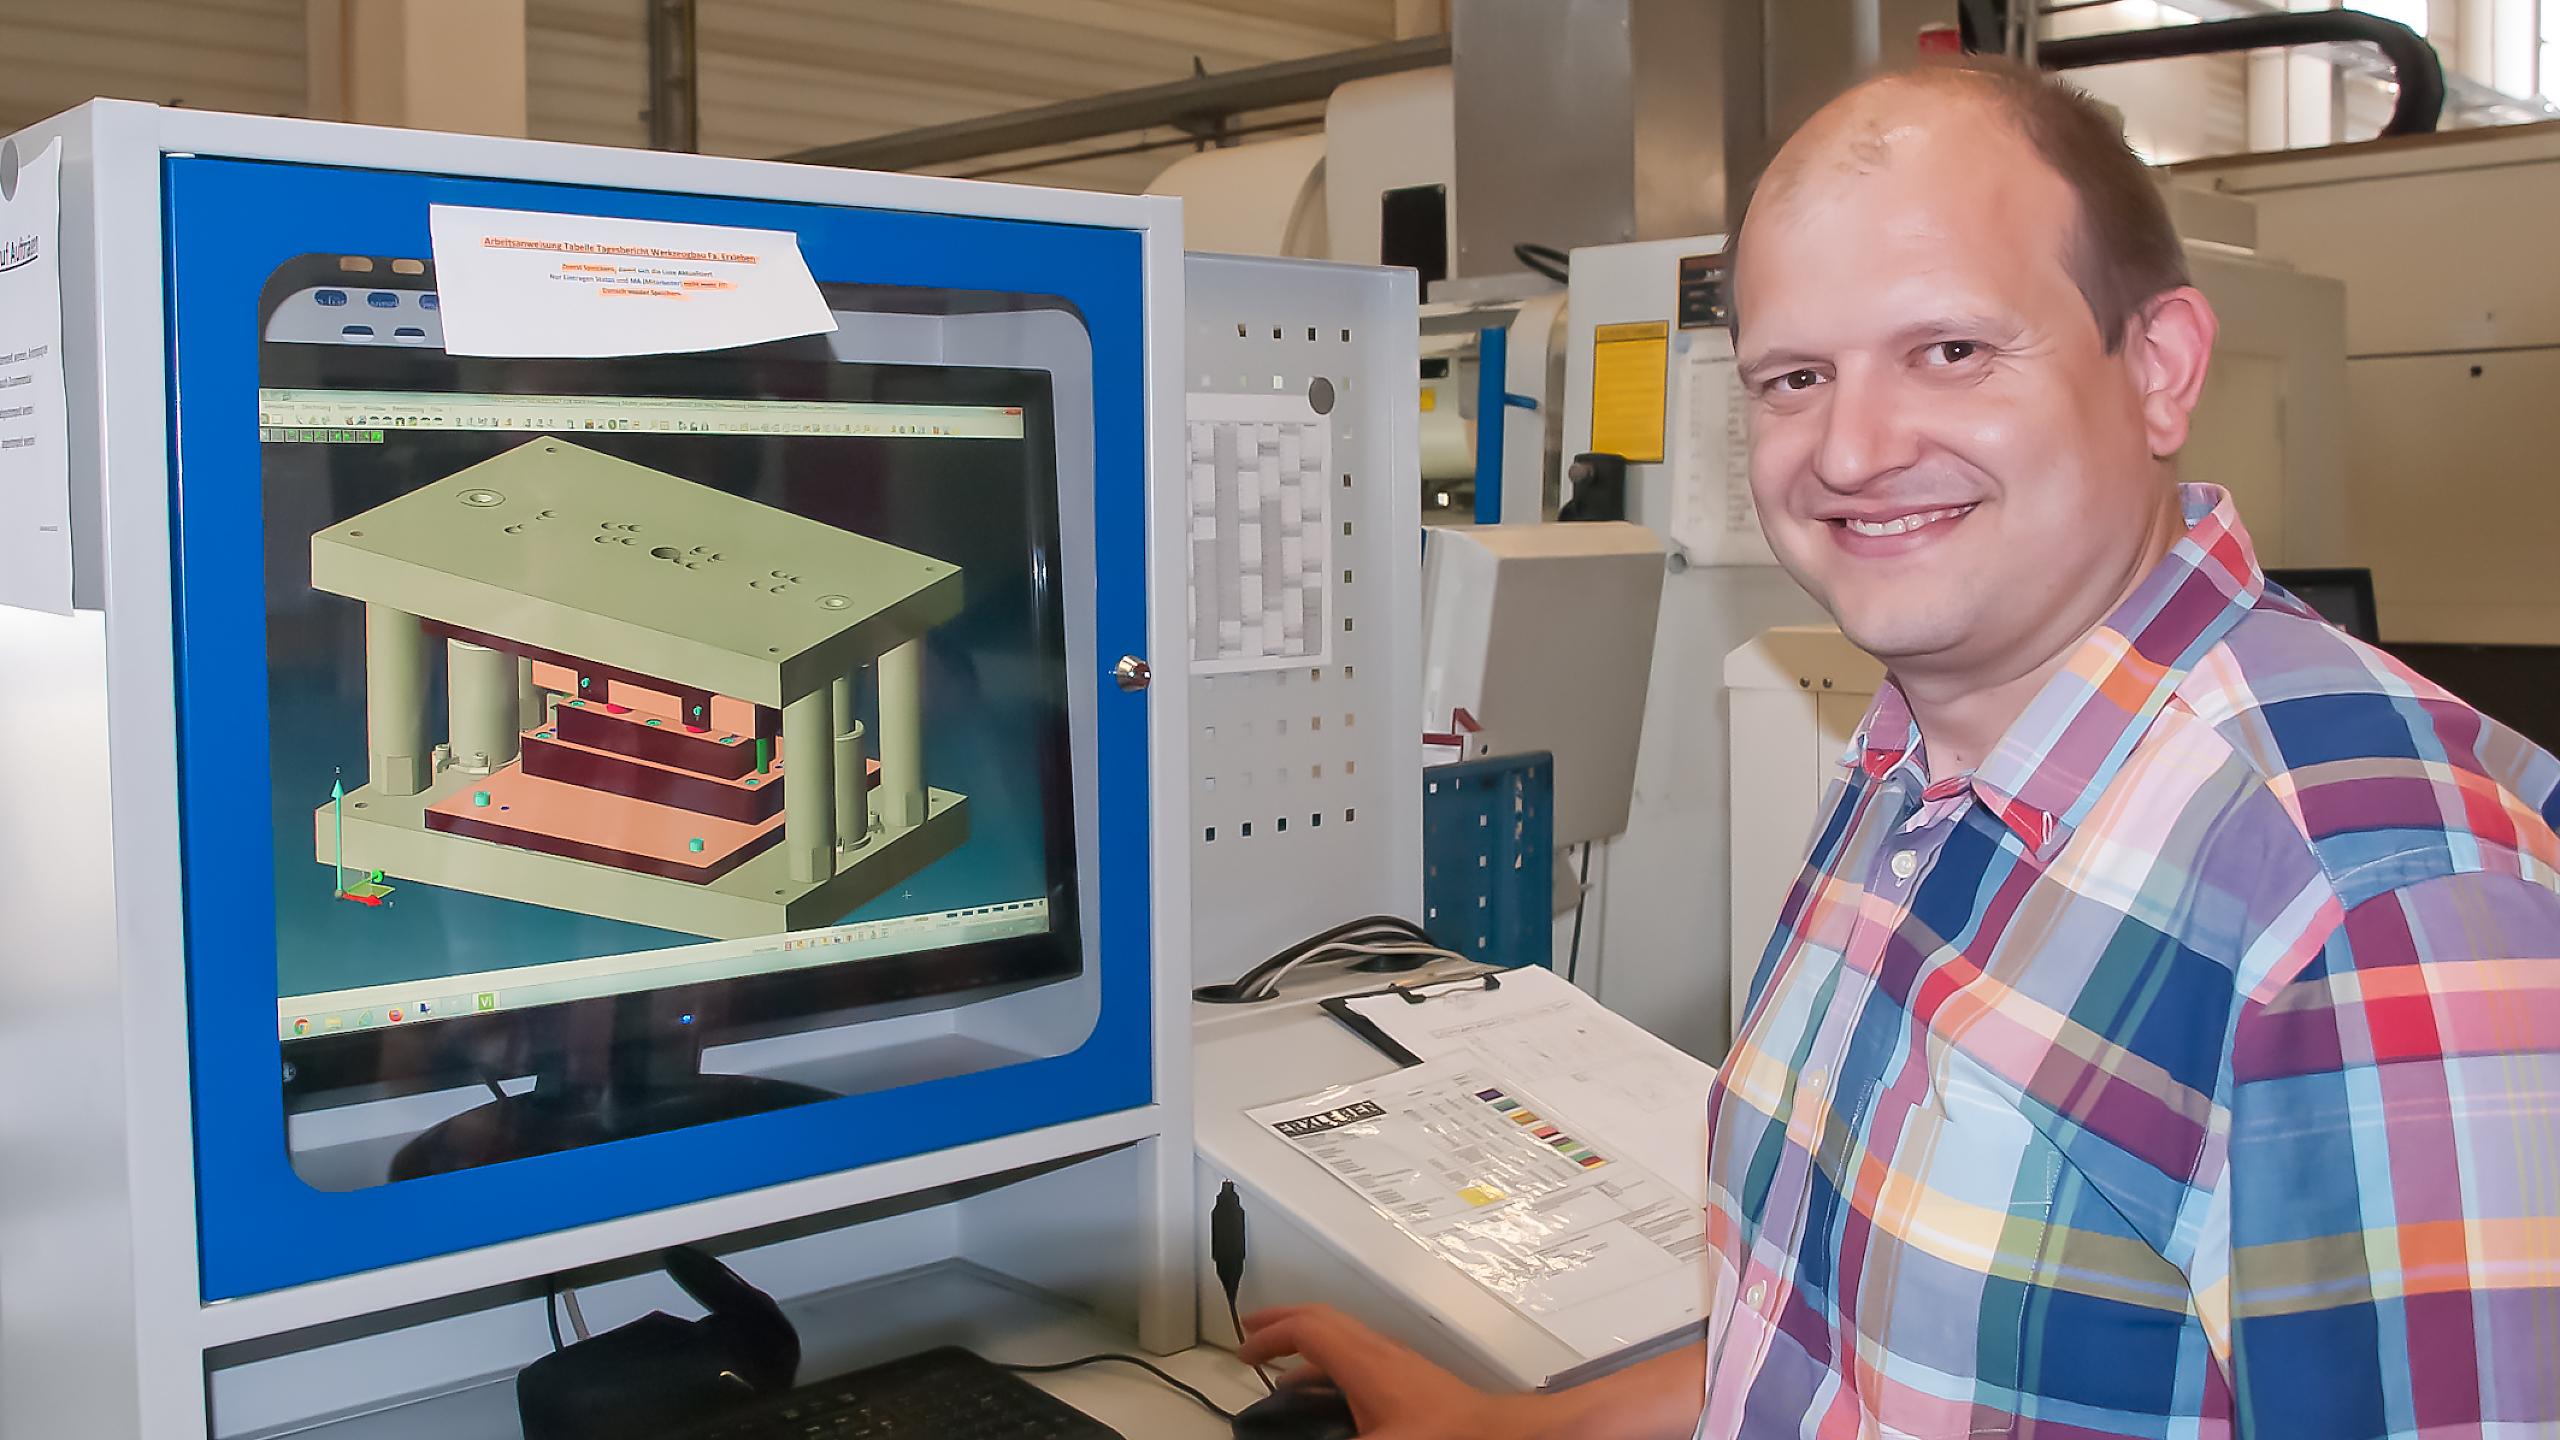 Kurt Erxleben GmbH & Co. KG